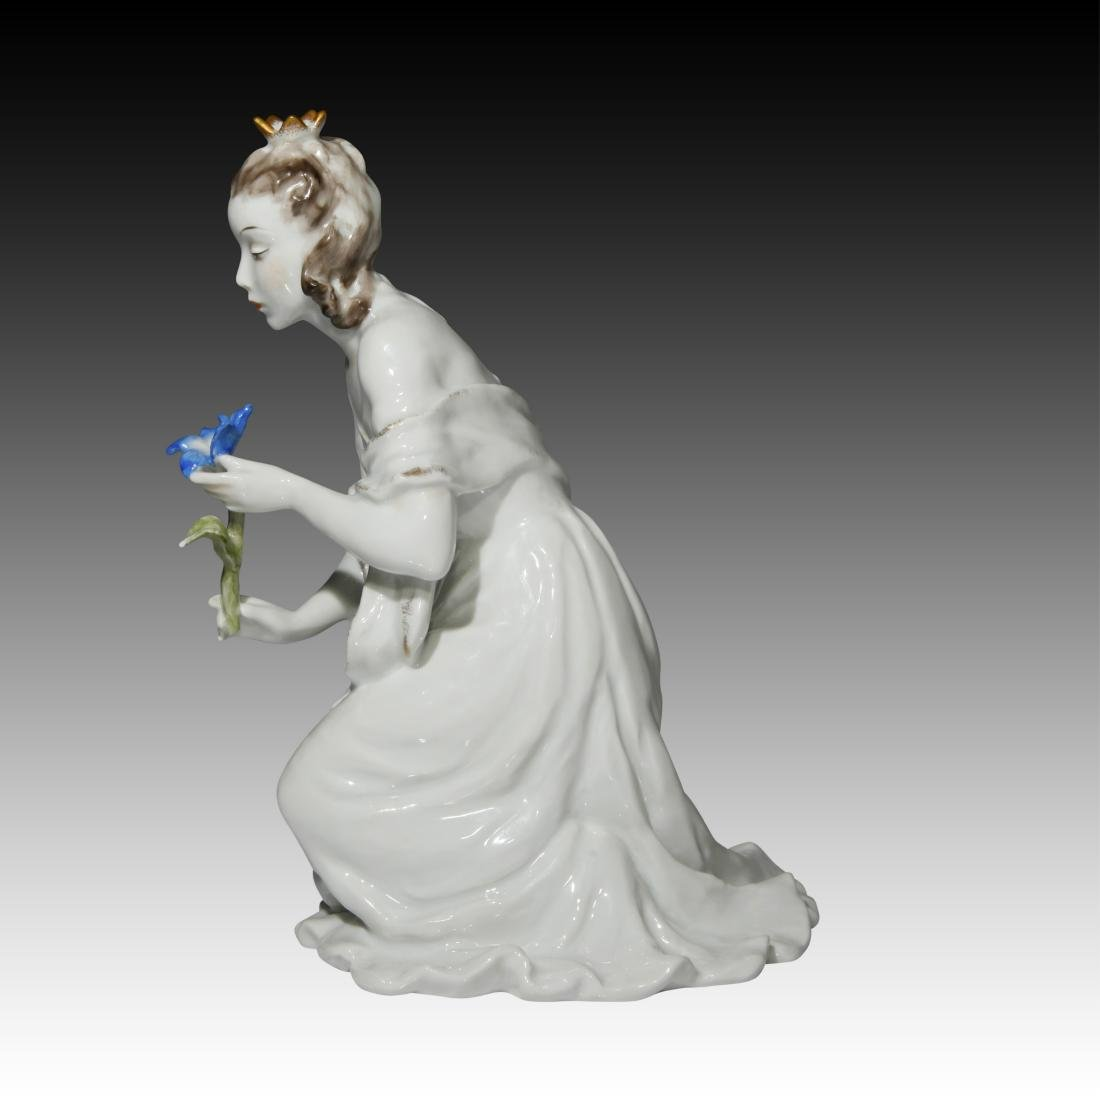 Rosenthal Figurine Princess with Flower # 7012 - 2